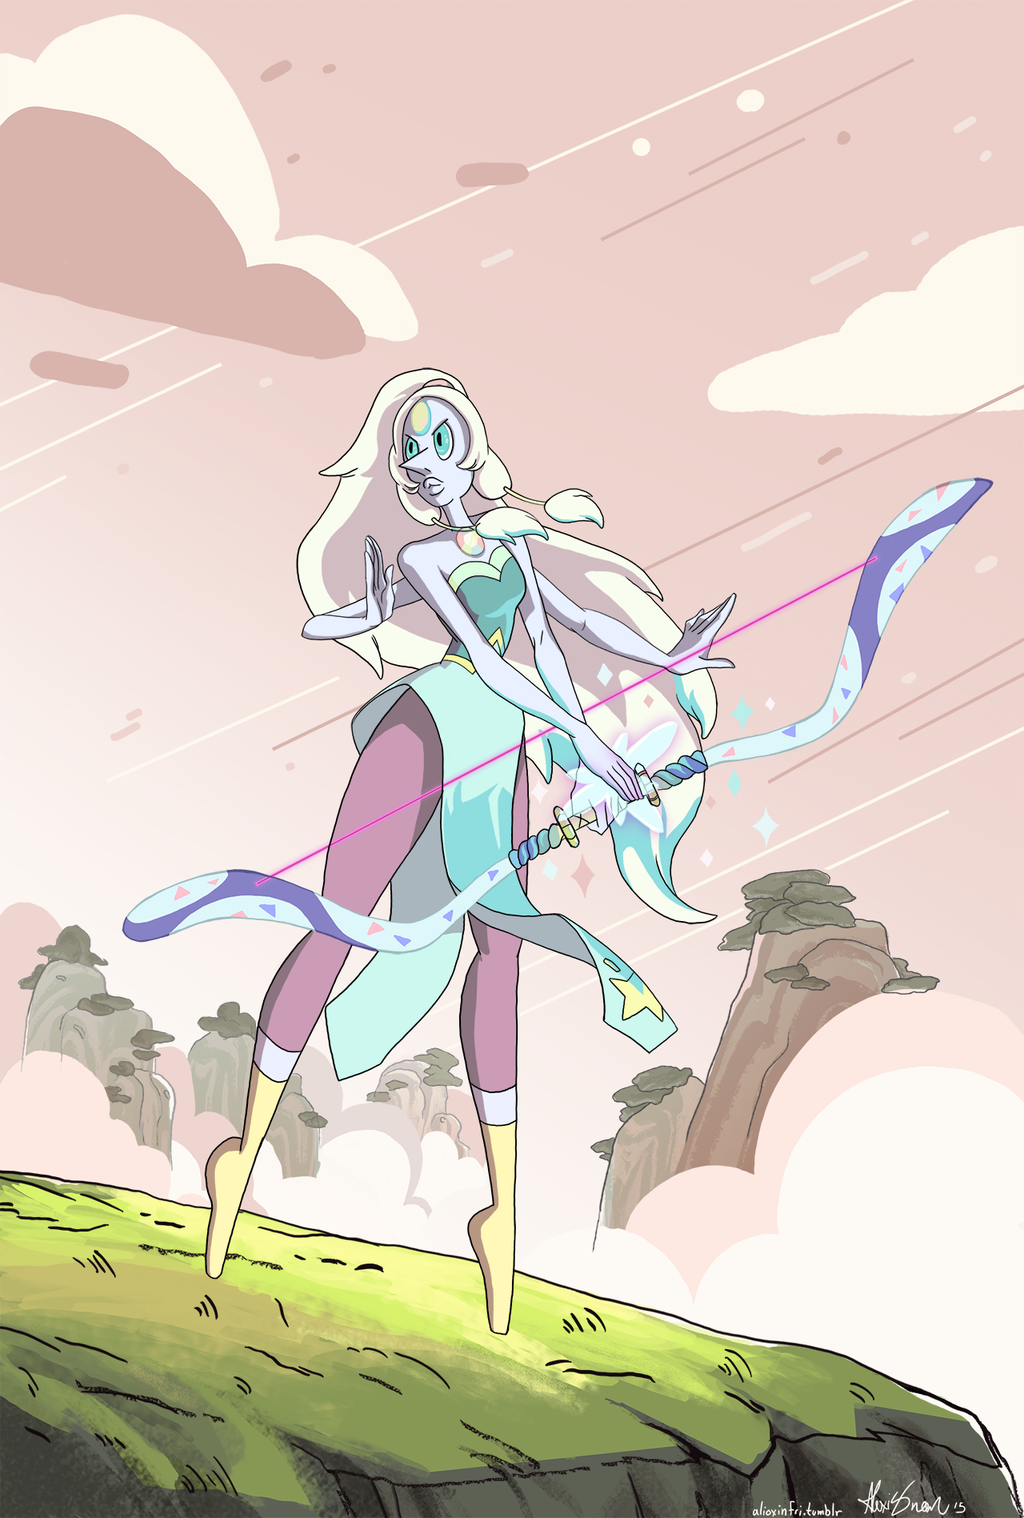 Steven Universe- Opal by Alioxinfri on DeviantArt